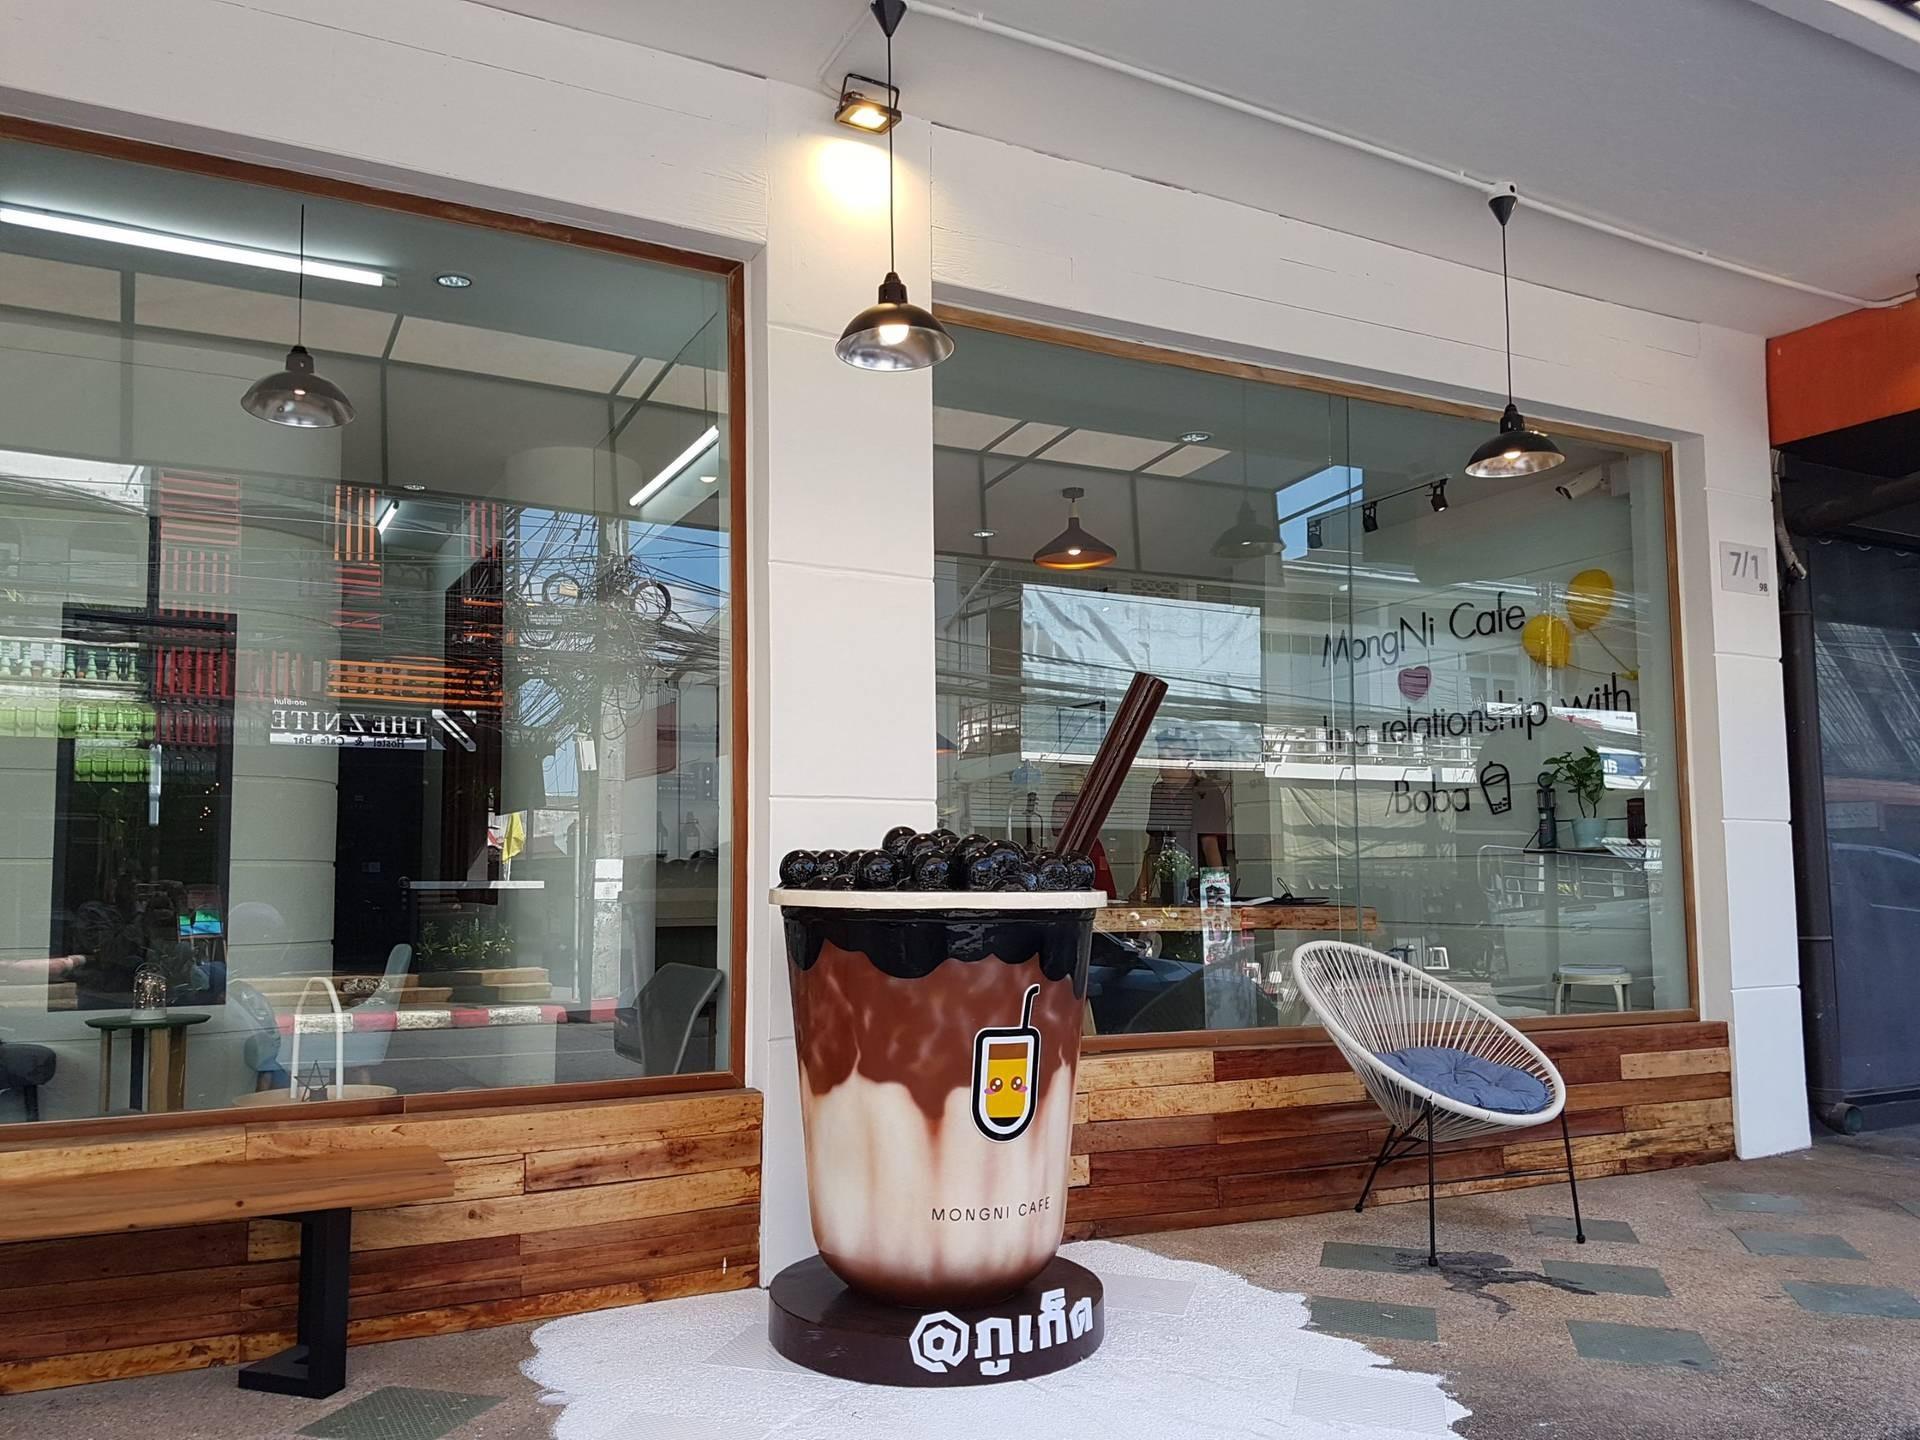 Mongni Cafe ภูเก็ต